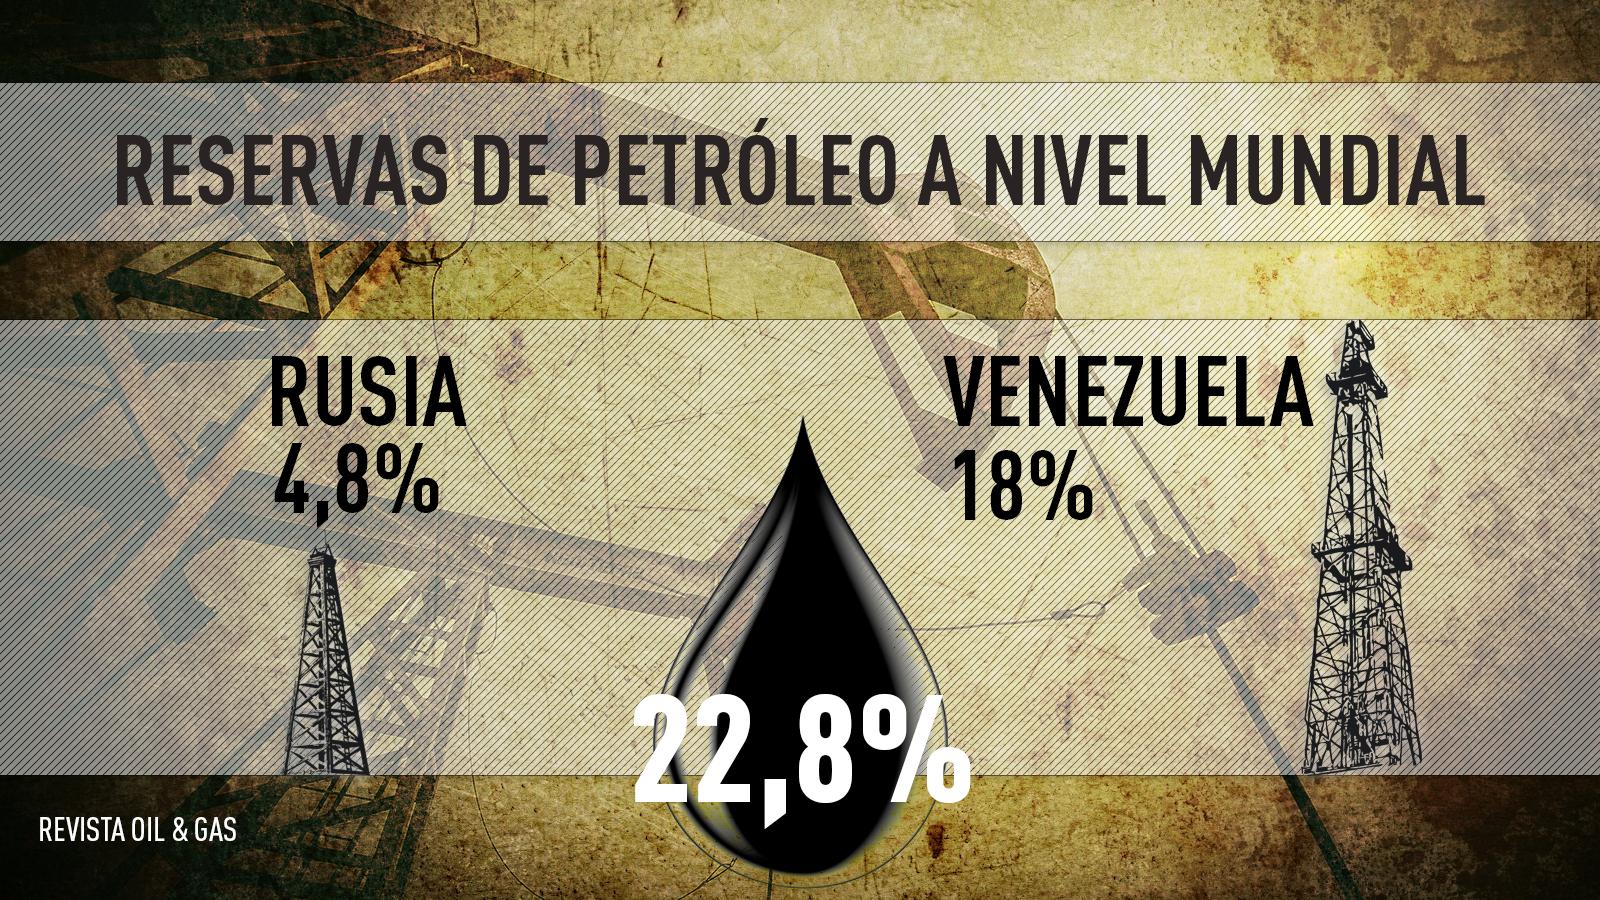 Reservas de petróleo a nivel mundial